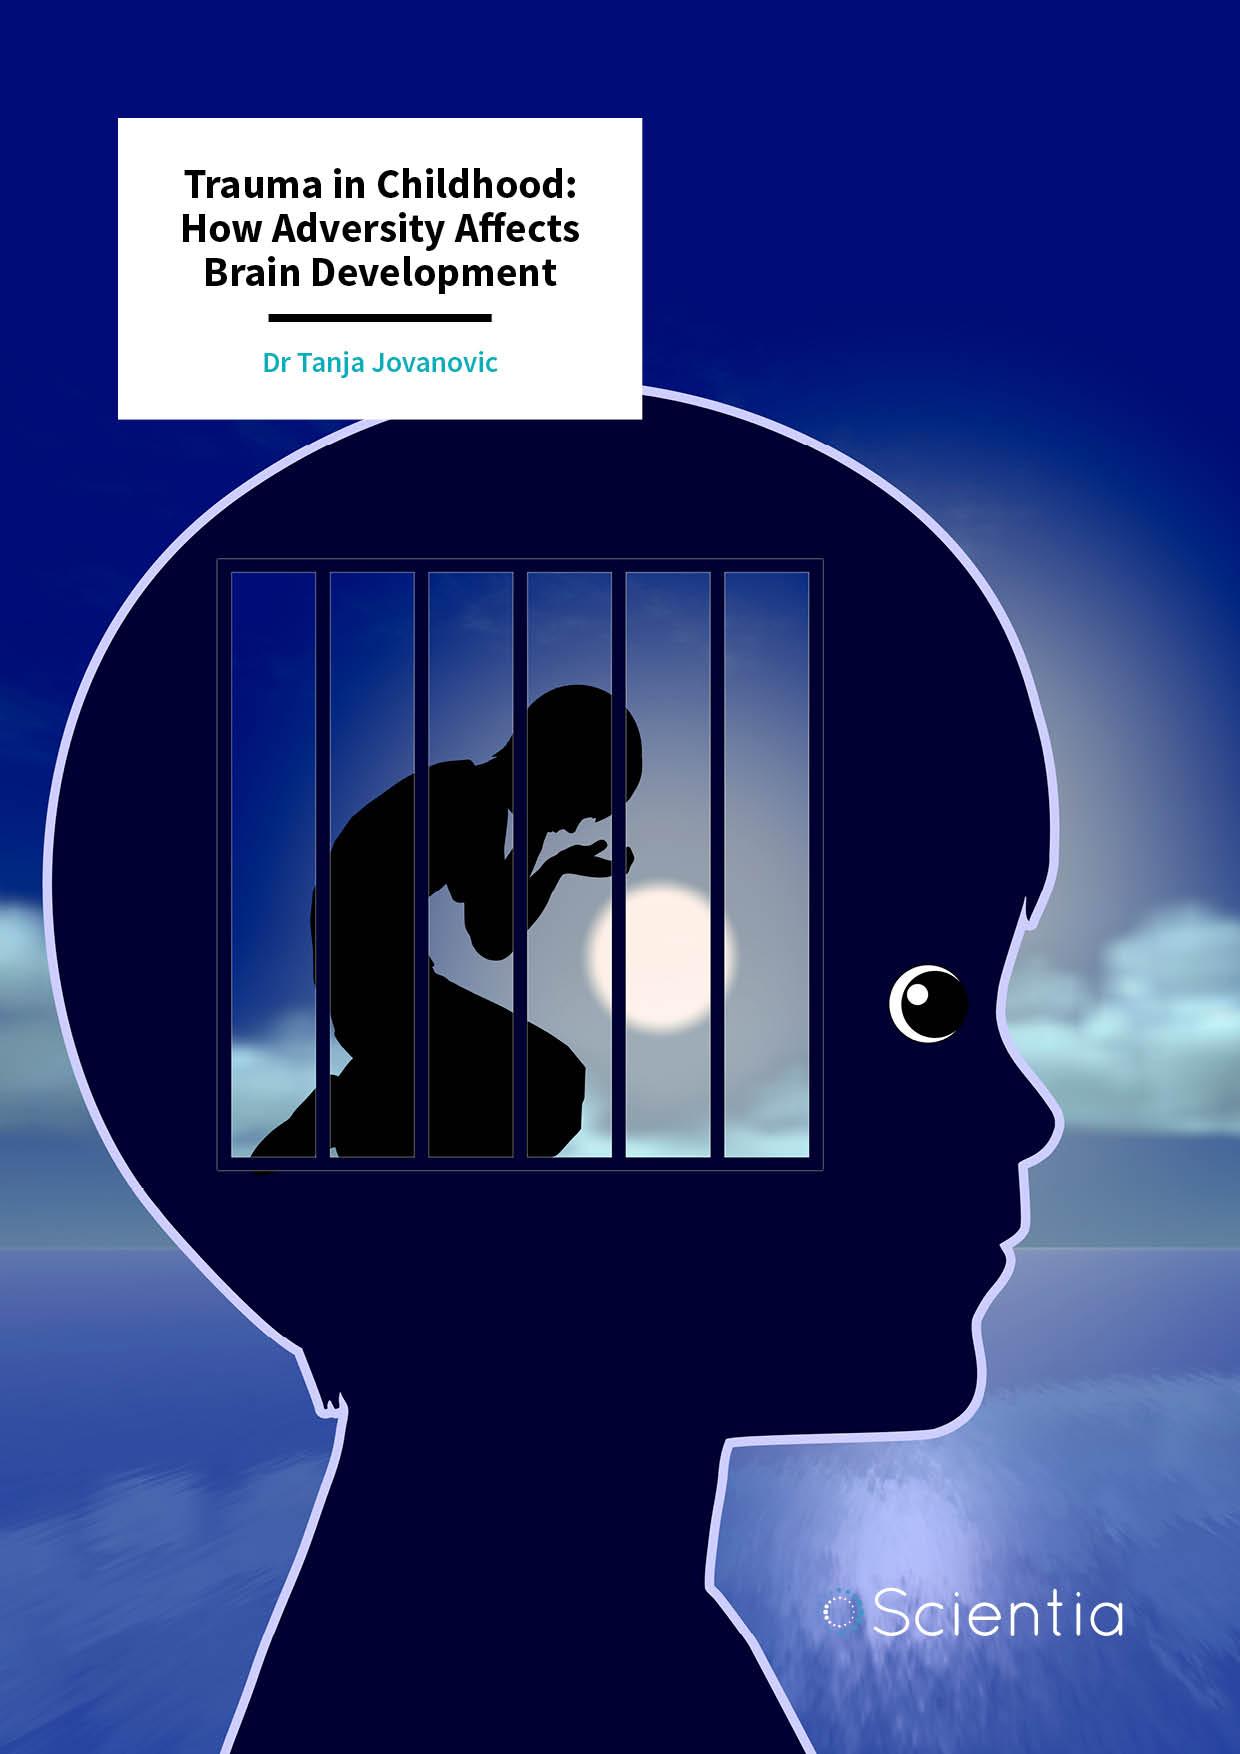 Dr Tanja Jovanovic – Trauma in Childhood: How Adversity Affects Brain Development